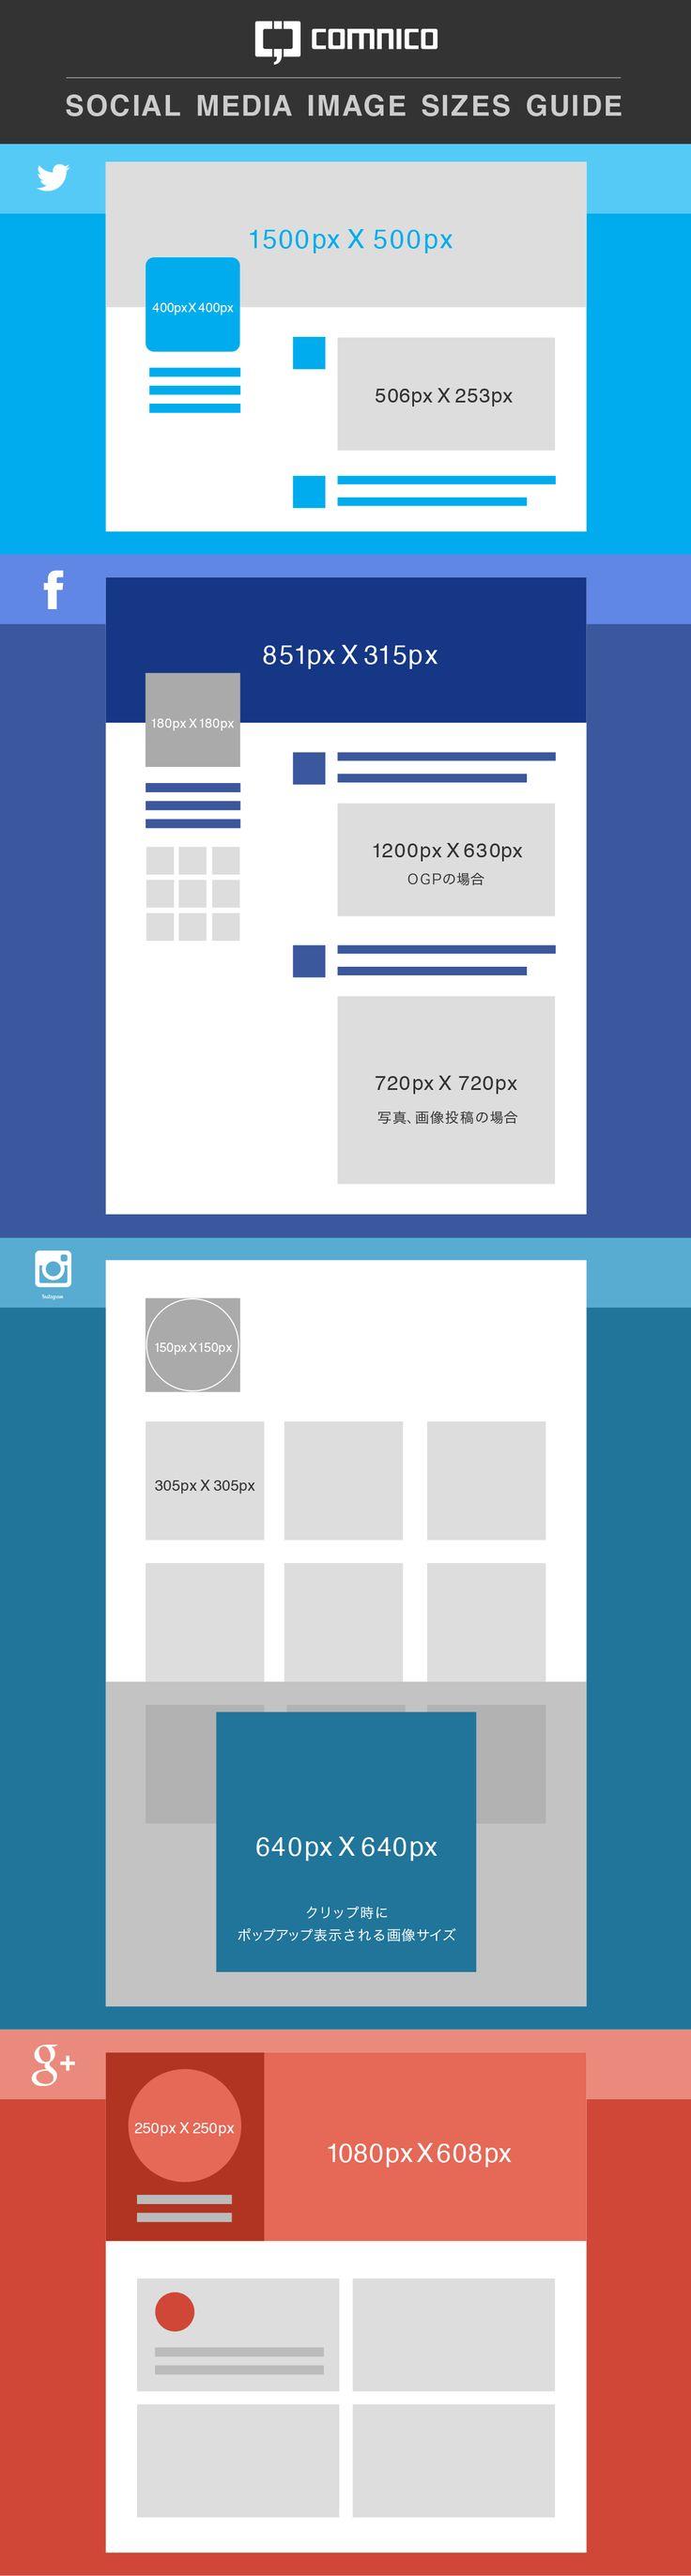 Twitter、Facebook、Instagram、Google+の最適な画像サイズをまとめました。